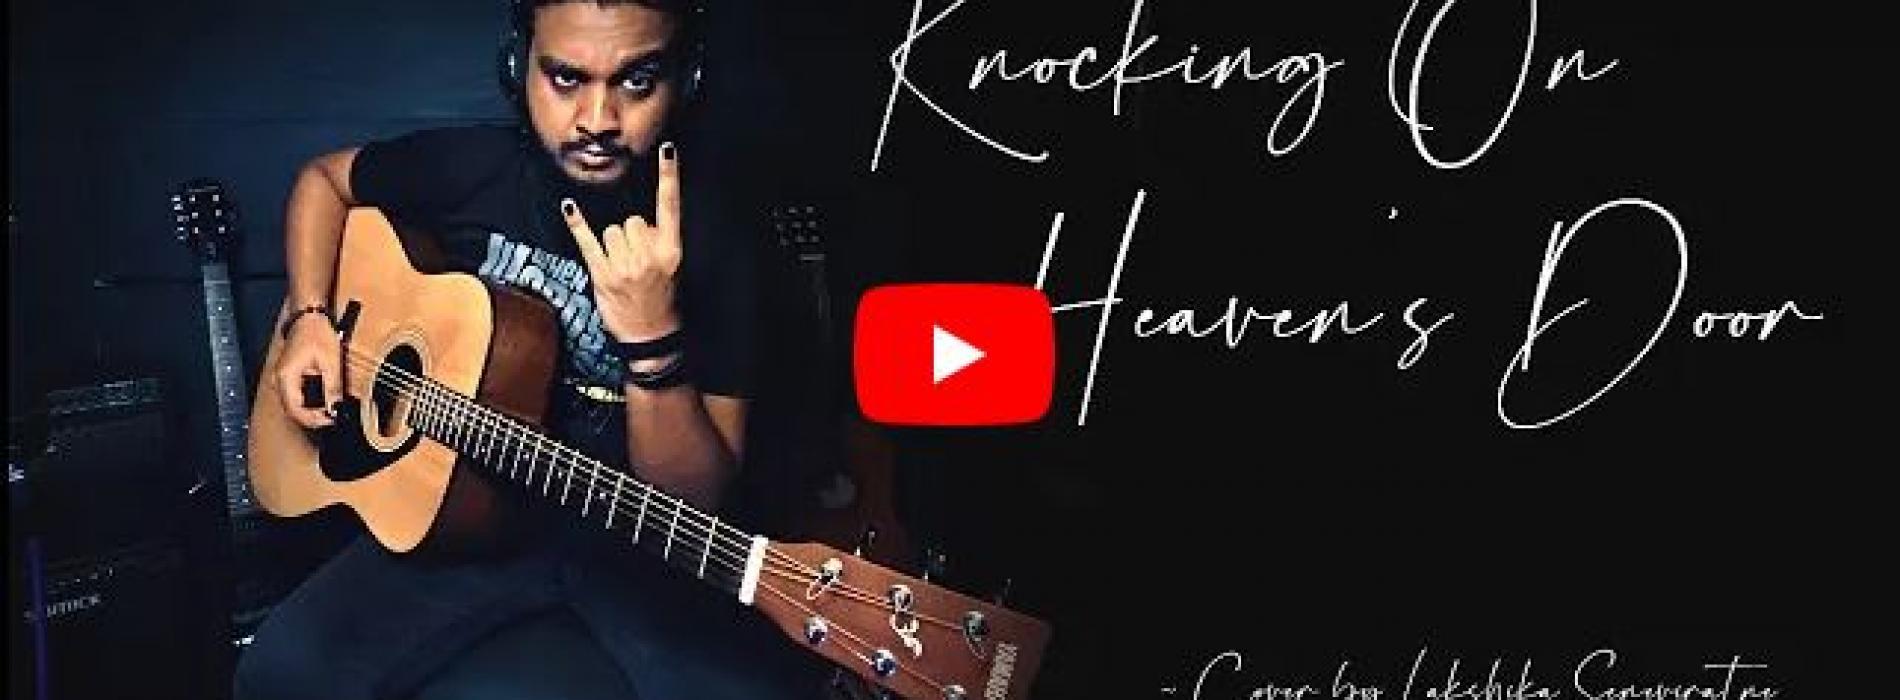 New Music : Knocking On Heavens Door – Cover By Lakshika Seneviratne